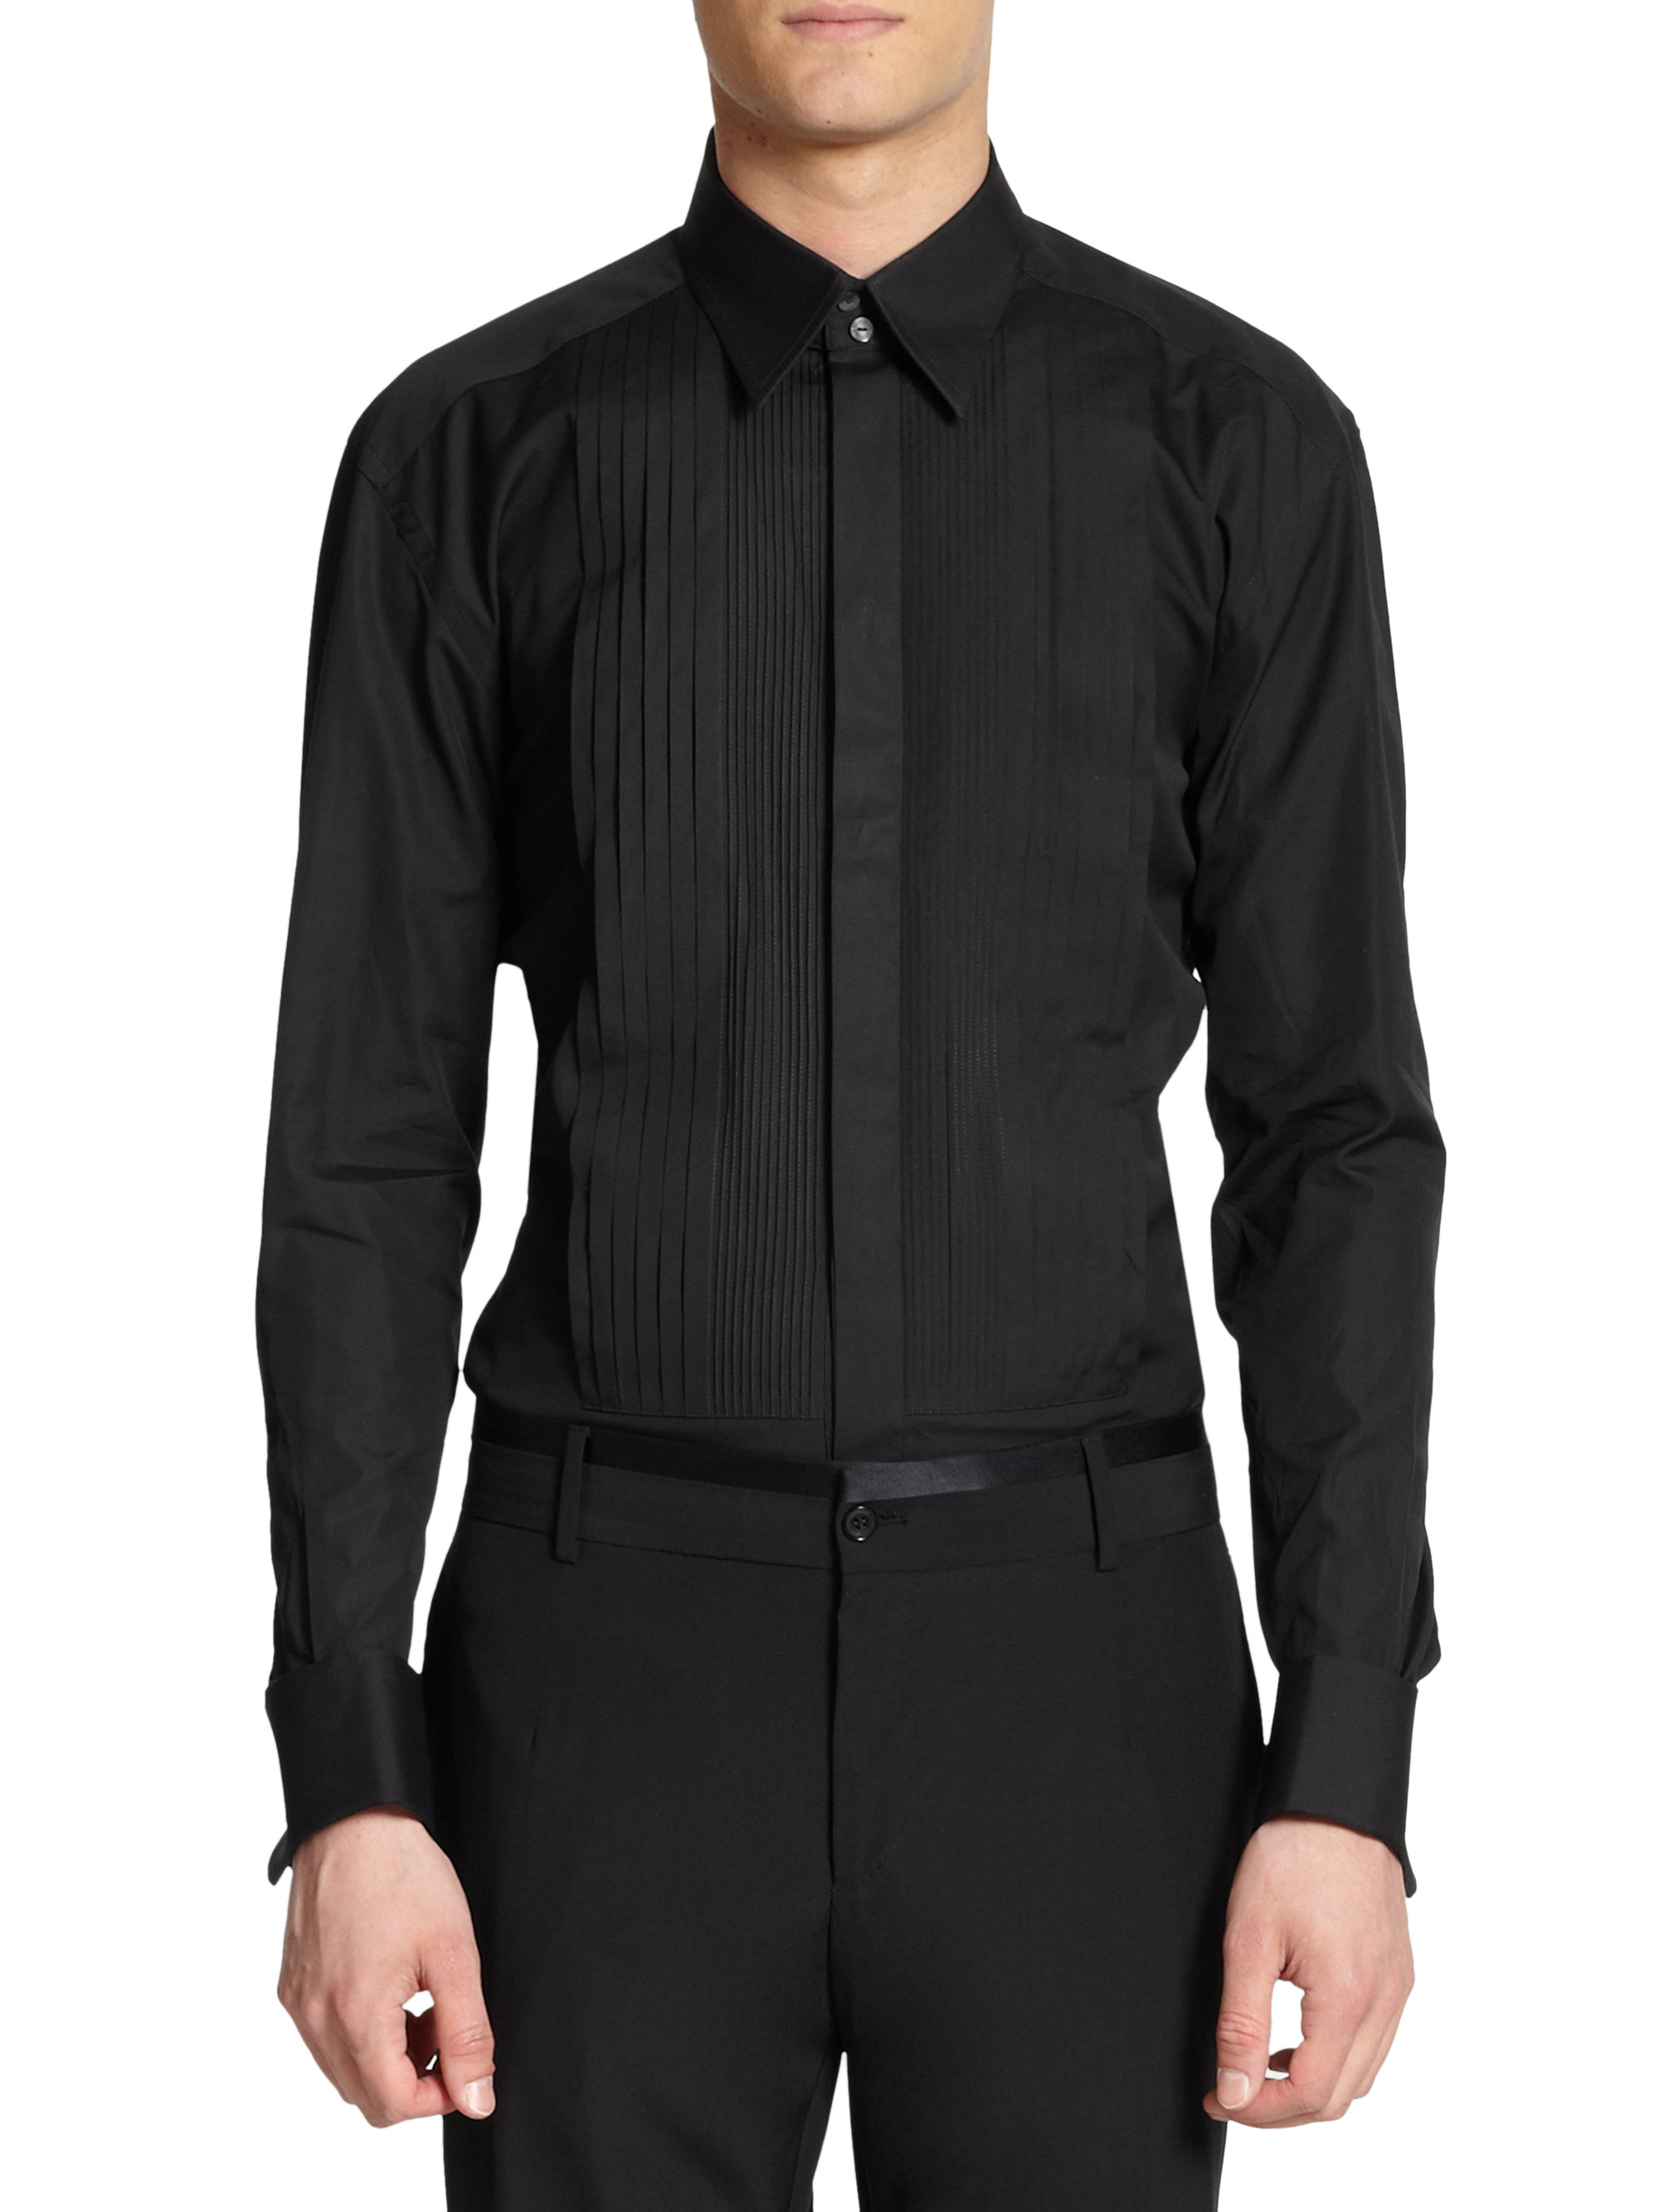 Dolce gabbana cotton buttonfront tuxedo shirtblack in for Tuxedo shirt black buttons